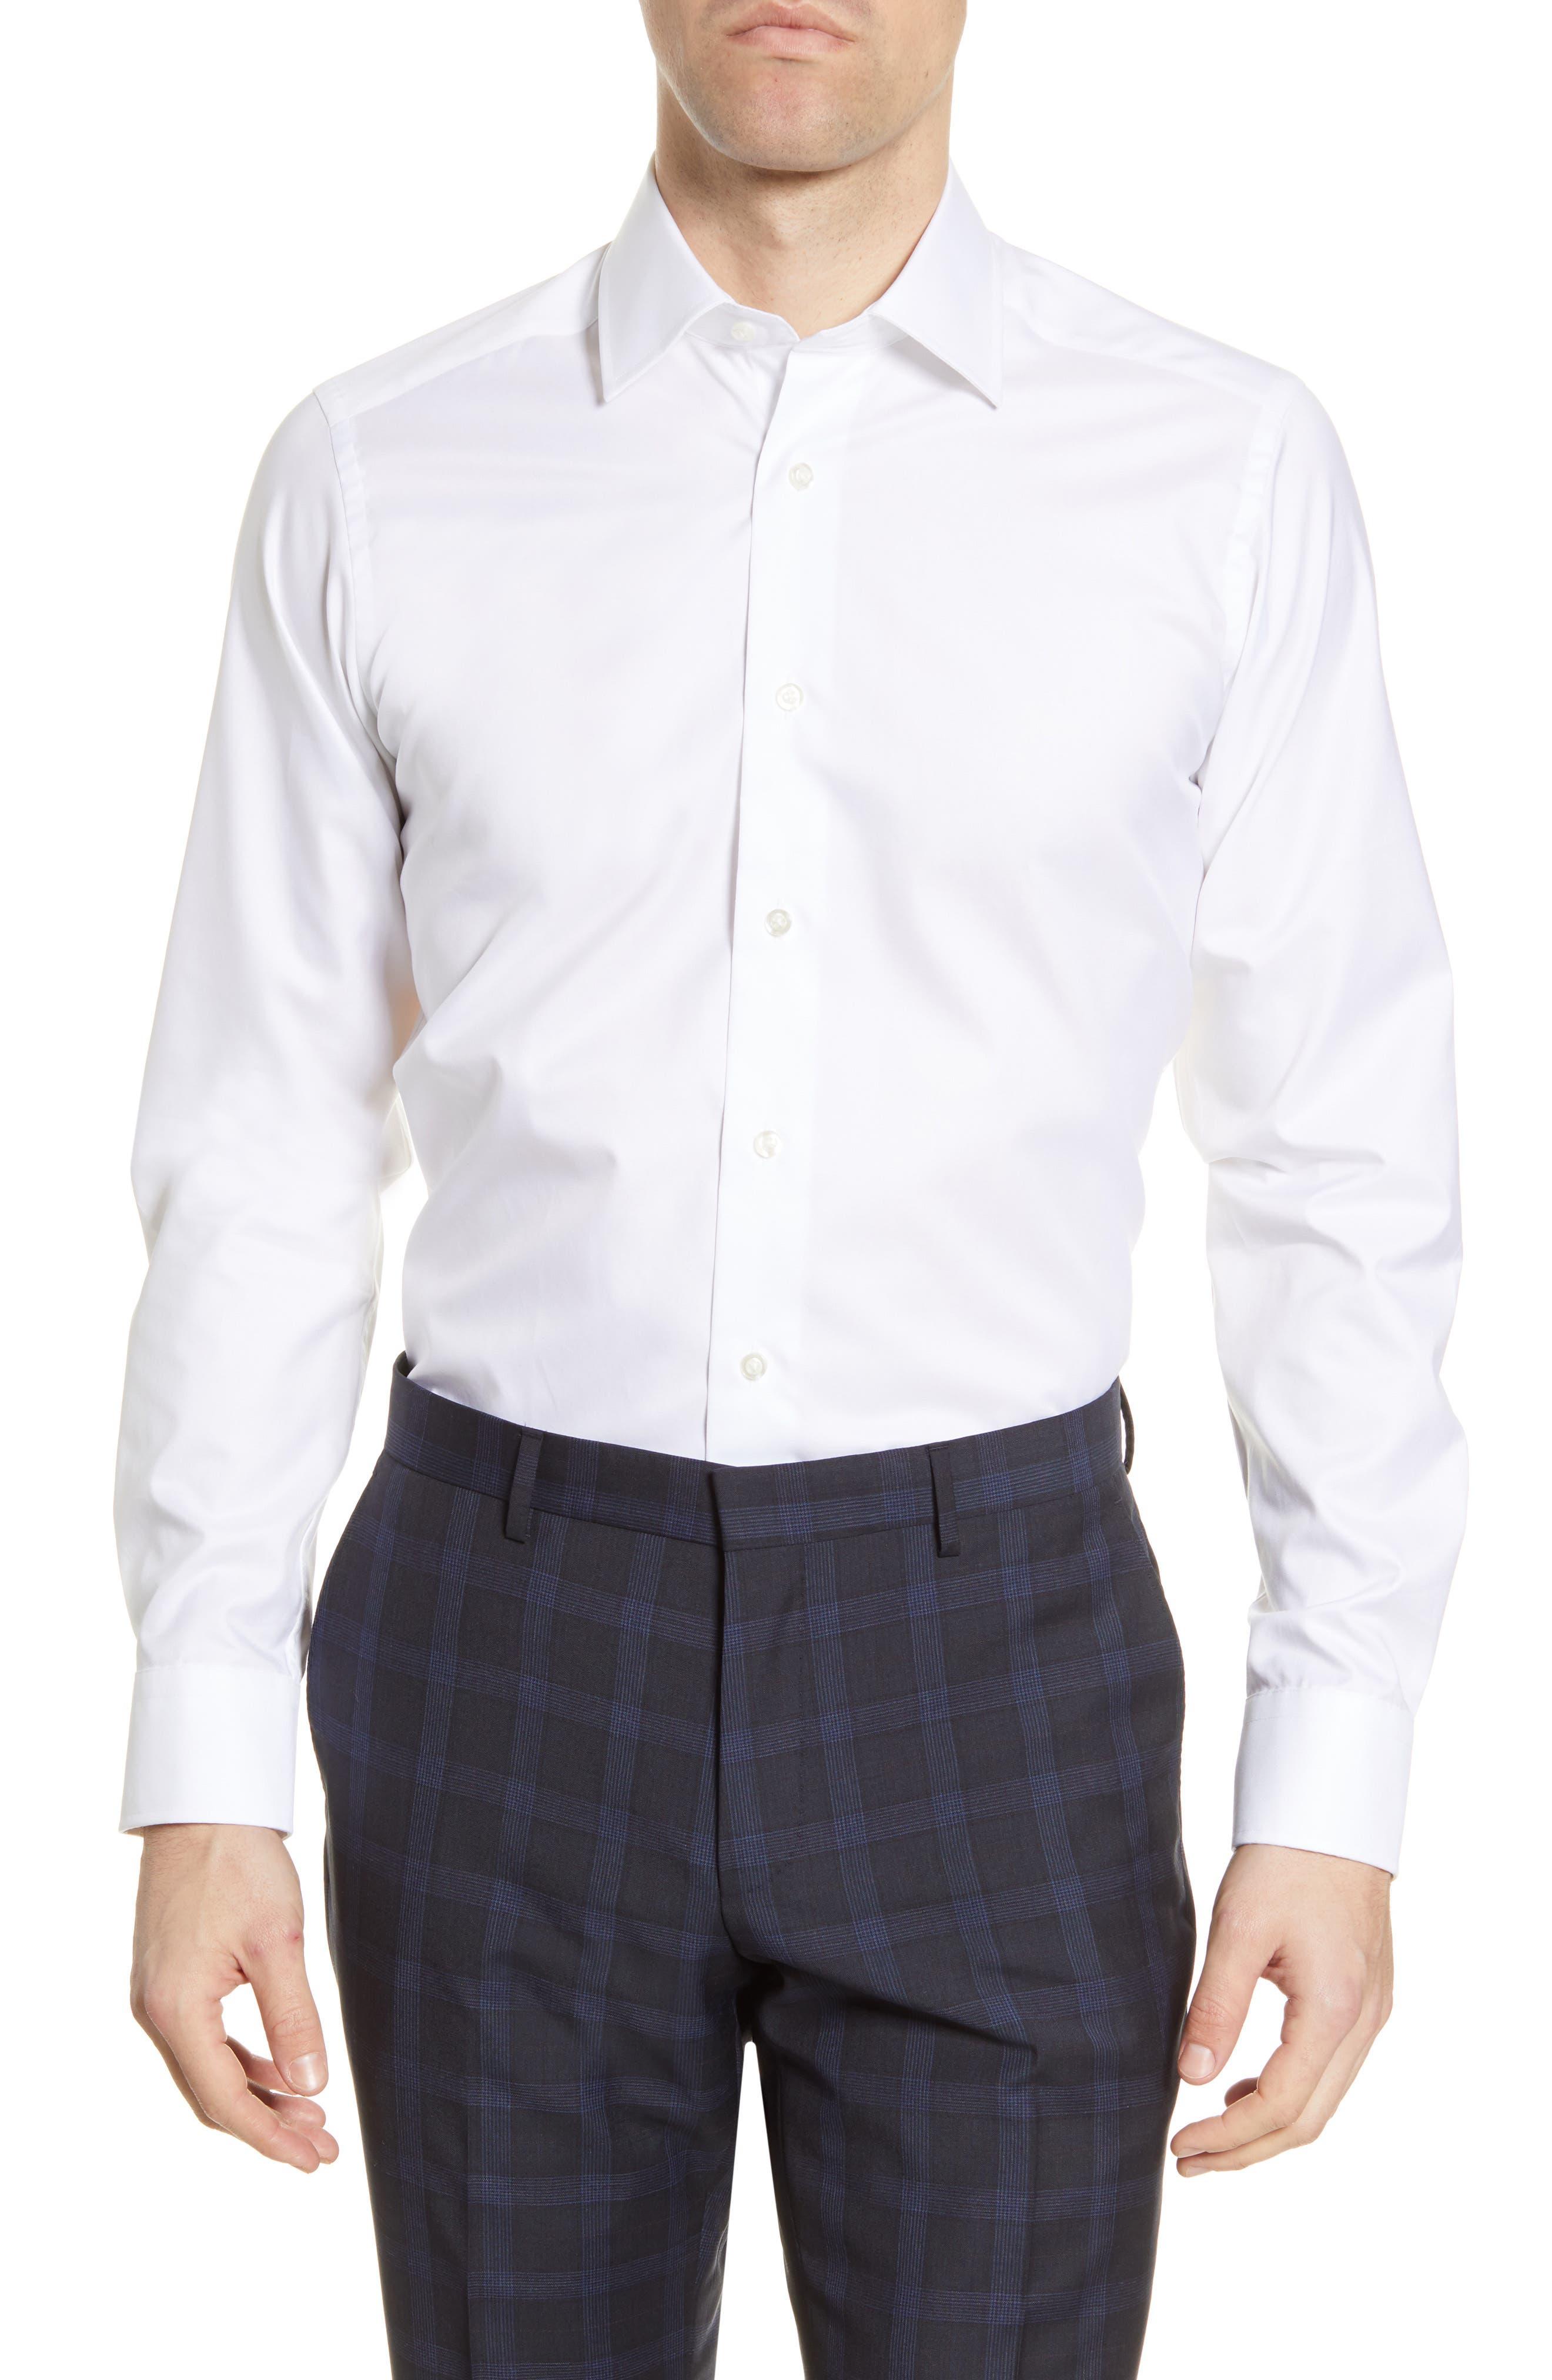 Slim Fit Solid Cotton Dress Shirt